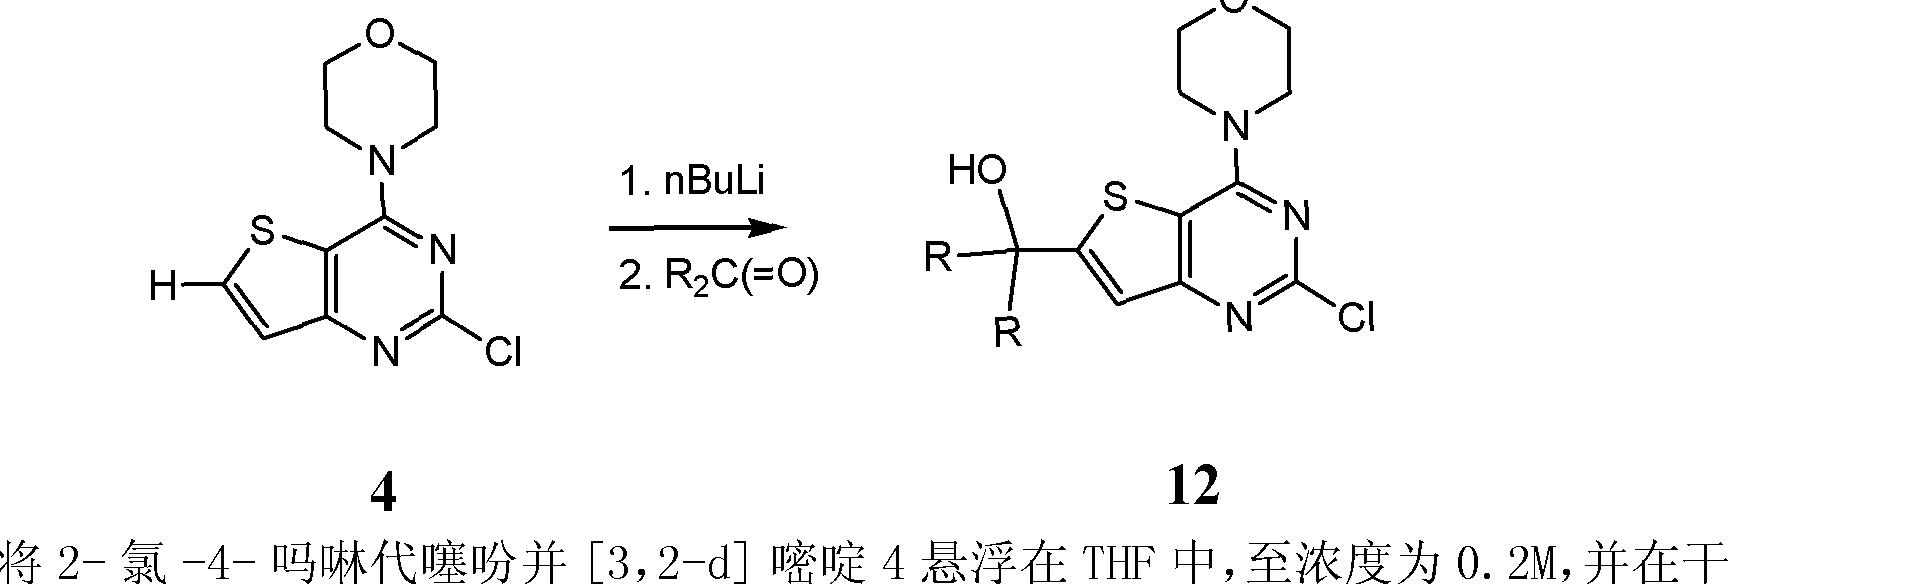 Figure CN102369011AD00713